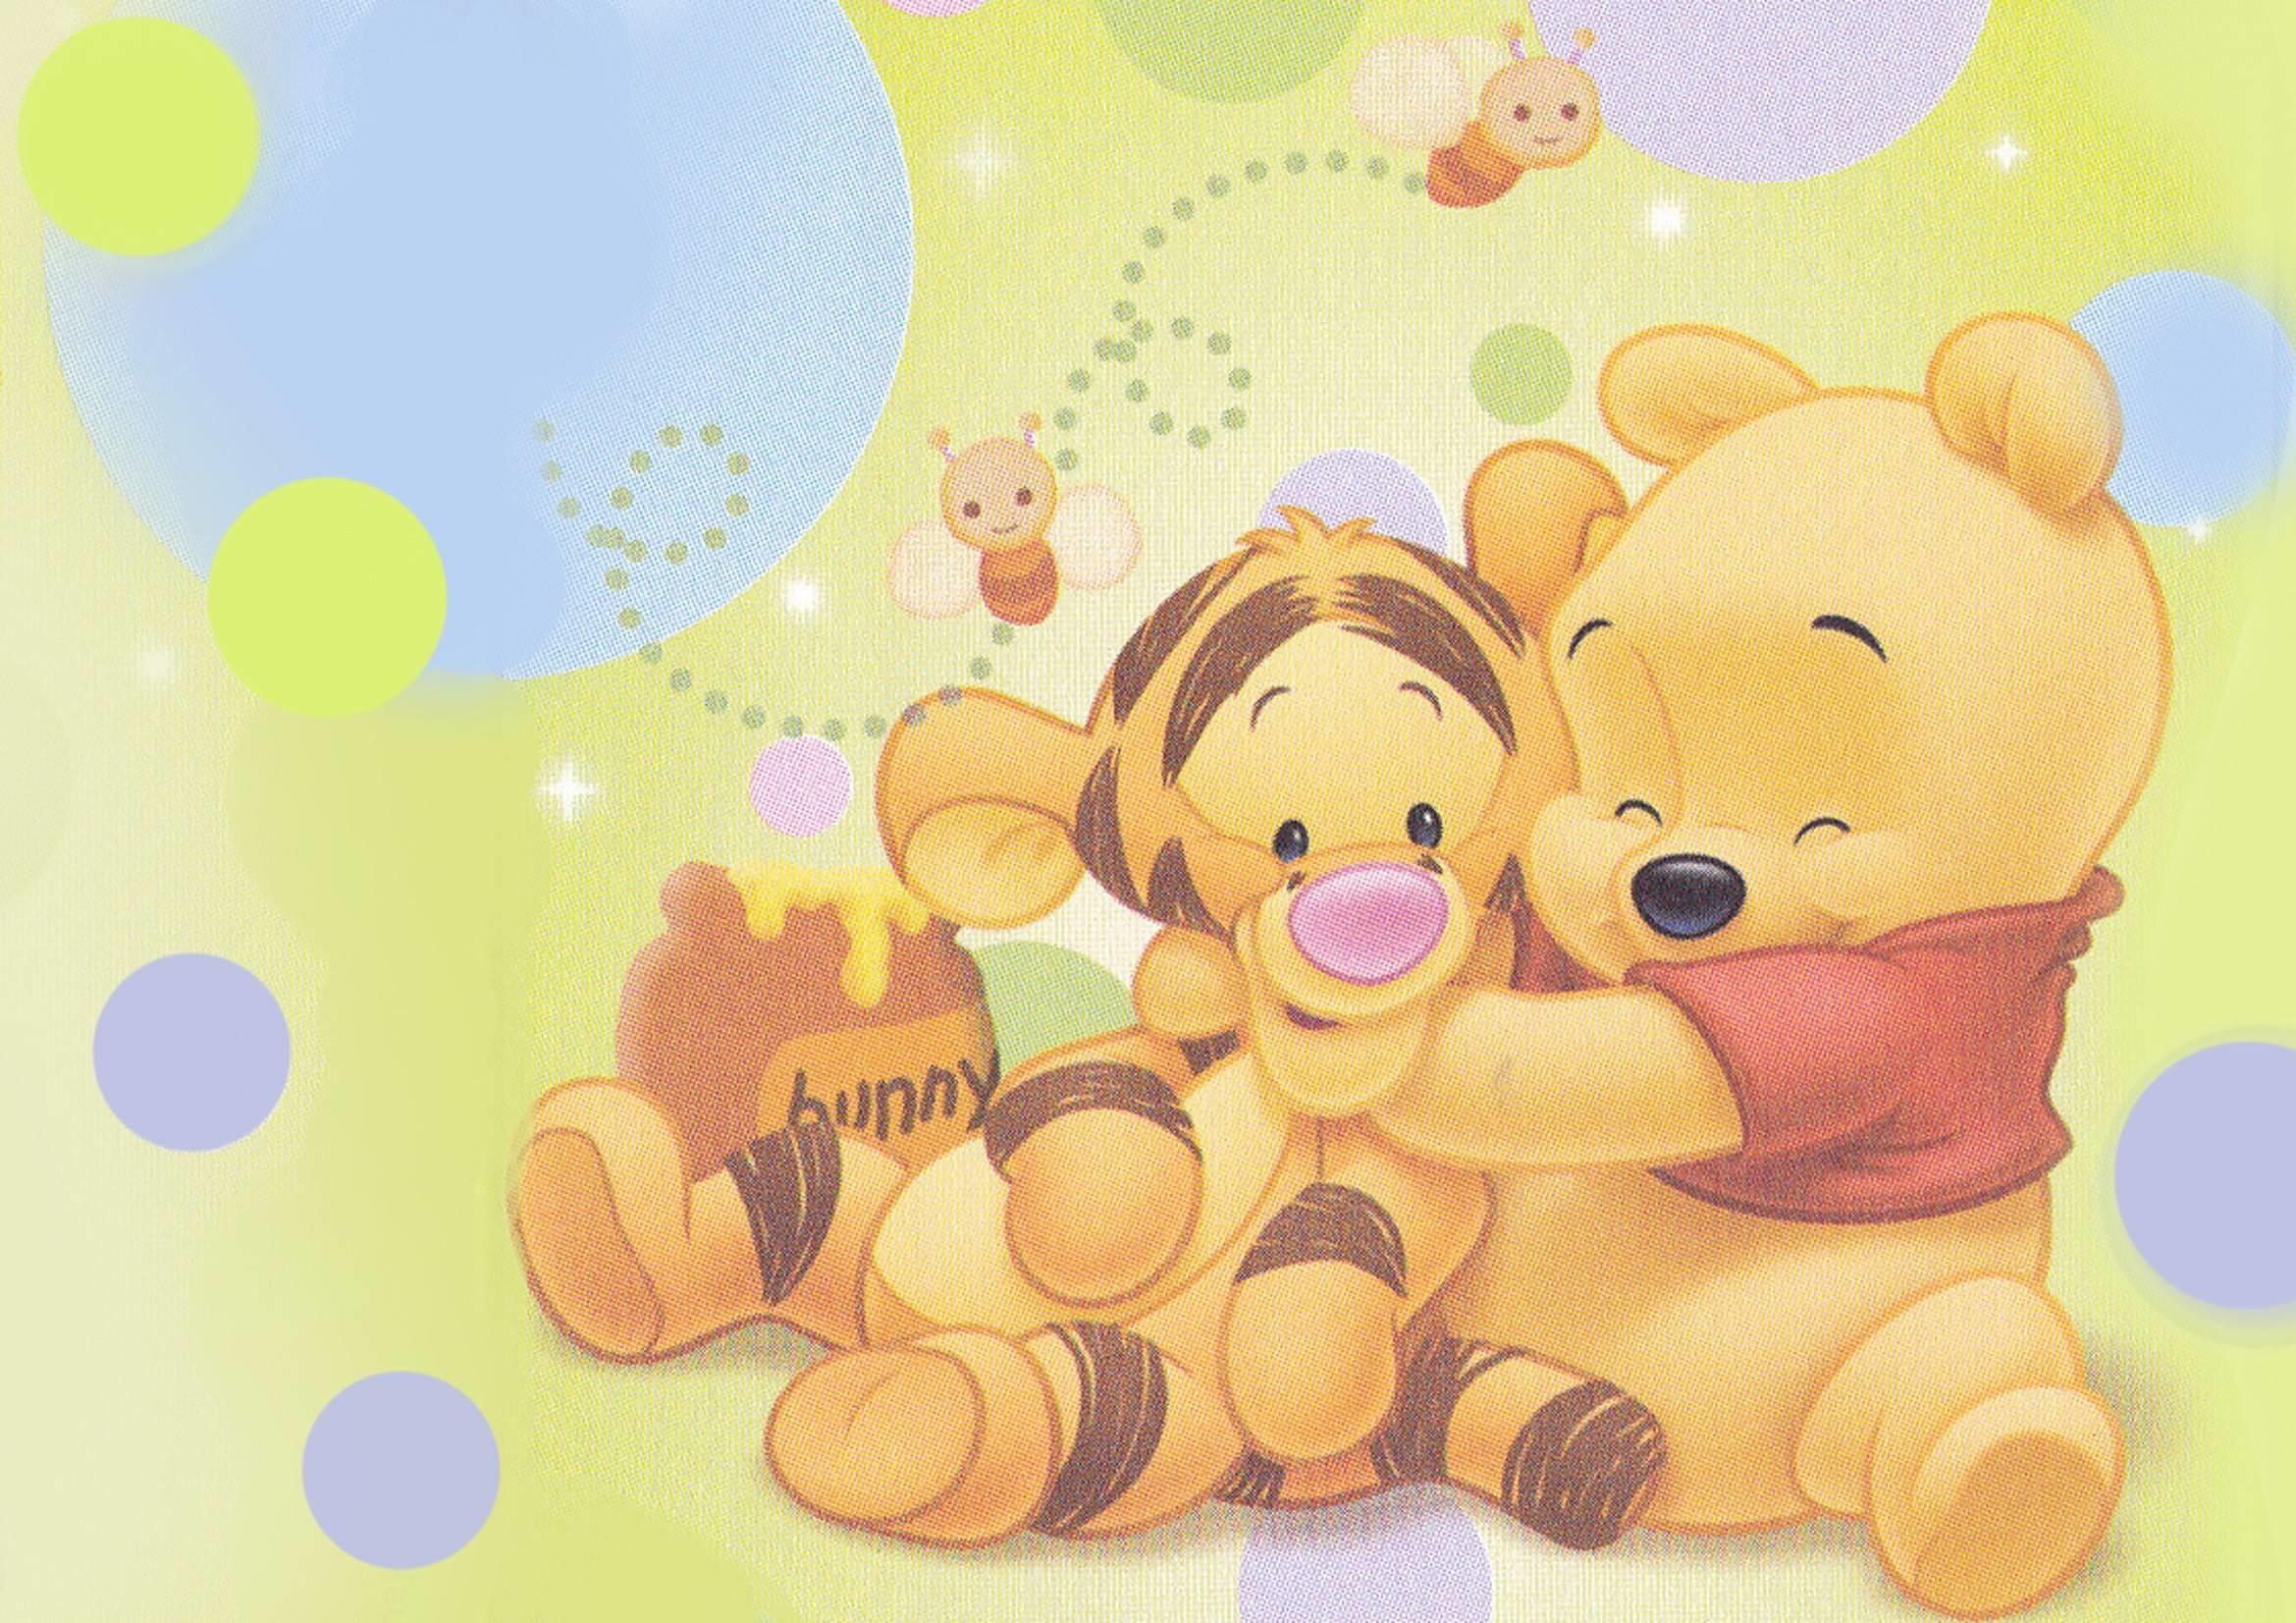 wallpaper pooh bear 56 images